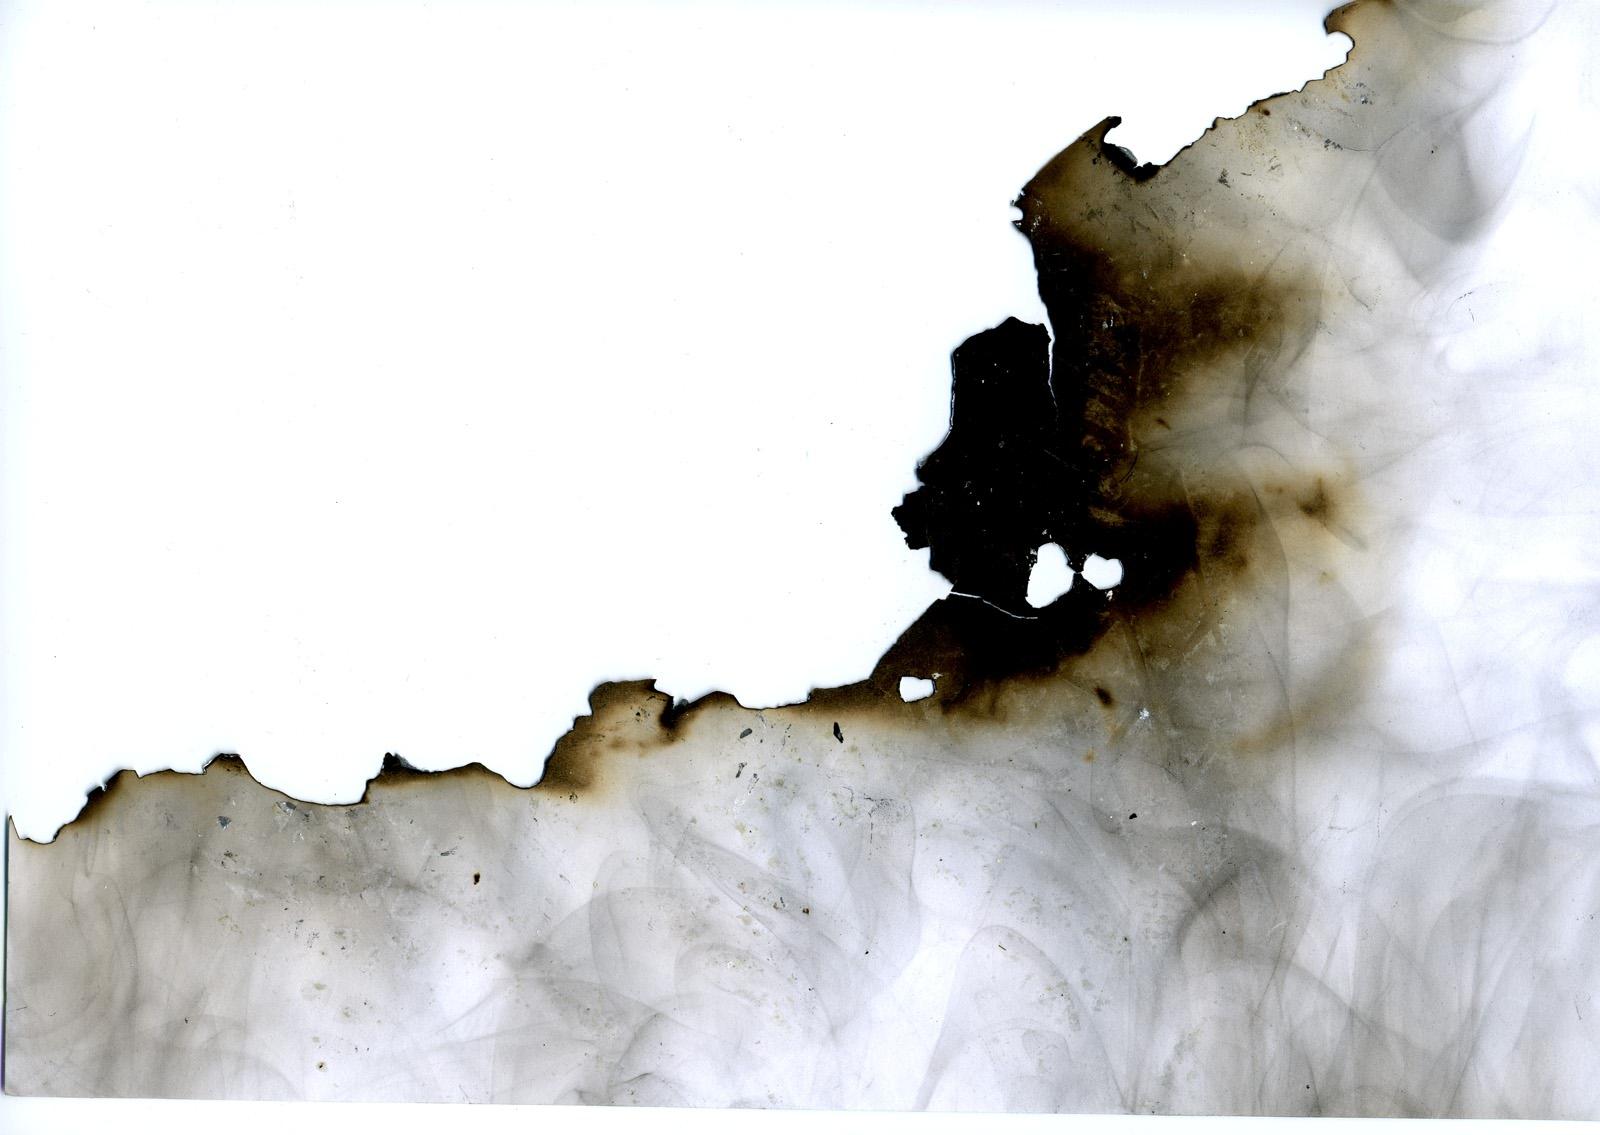 burnt-paper-texture-7.jpg - Просмотр картинки - Хостинг картинок, изображений и фотоальбомов